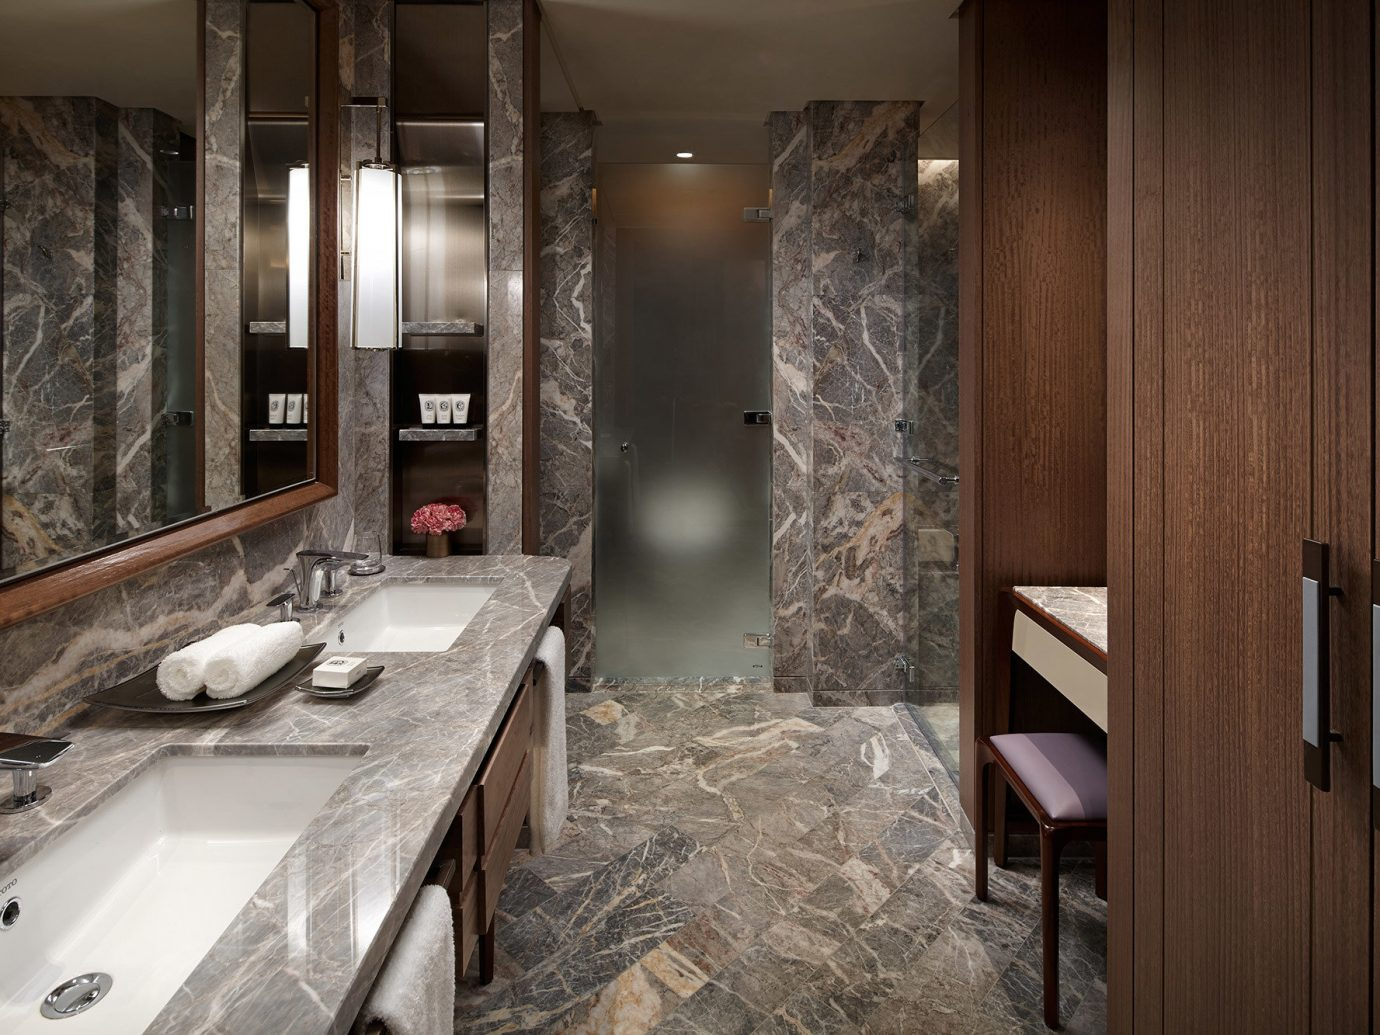 Hotels Luxury Travel indoor bathroom wall sink room countertop interior design flooring floor Bath basement bathtub